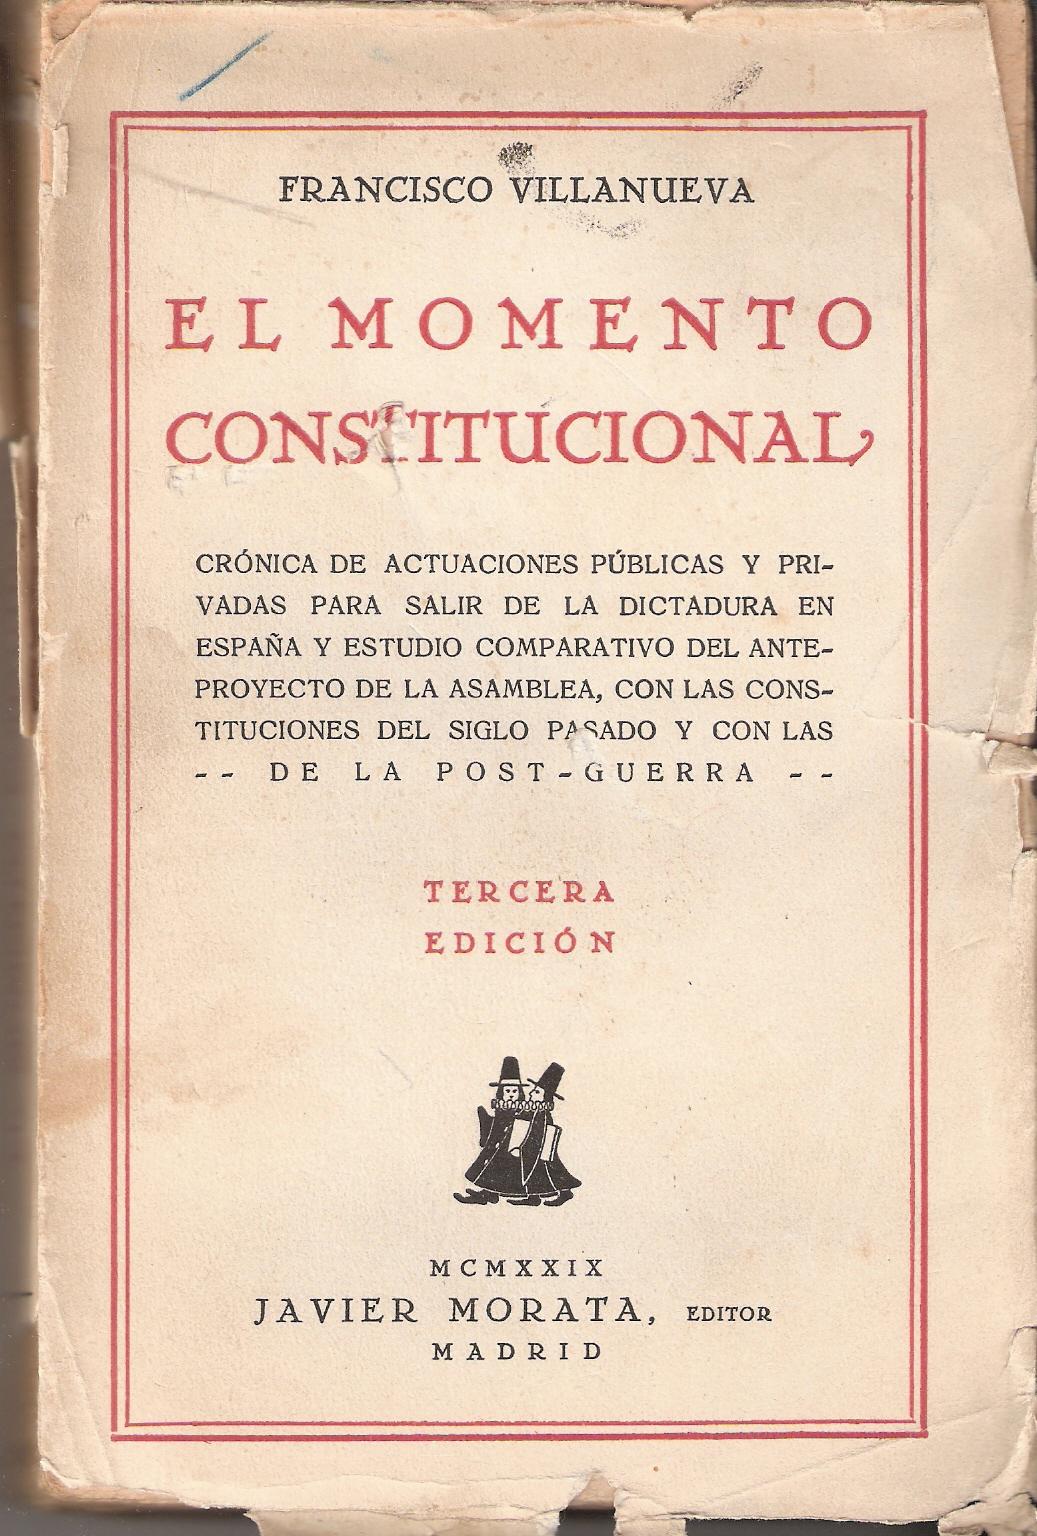 El Momento Constitucional